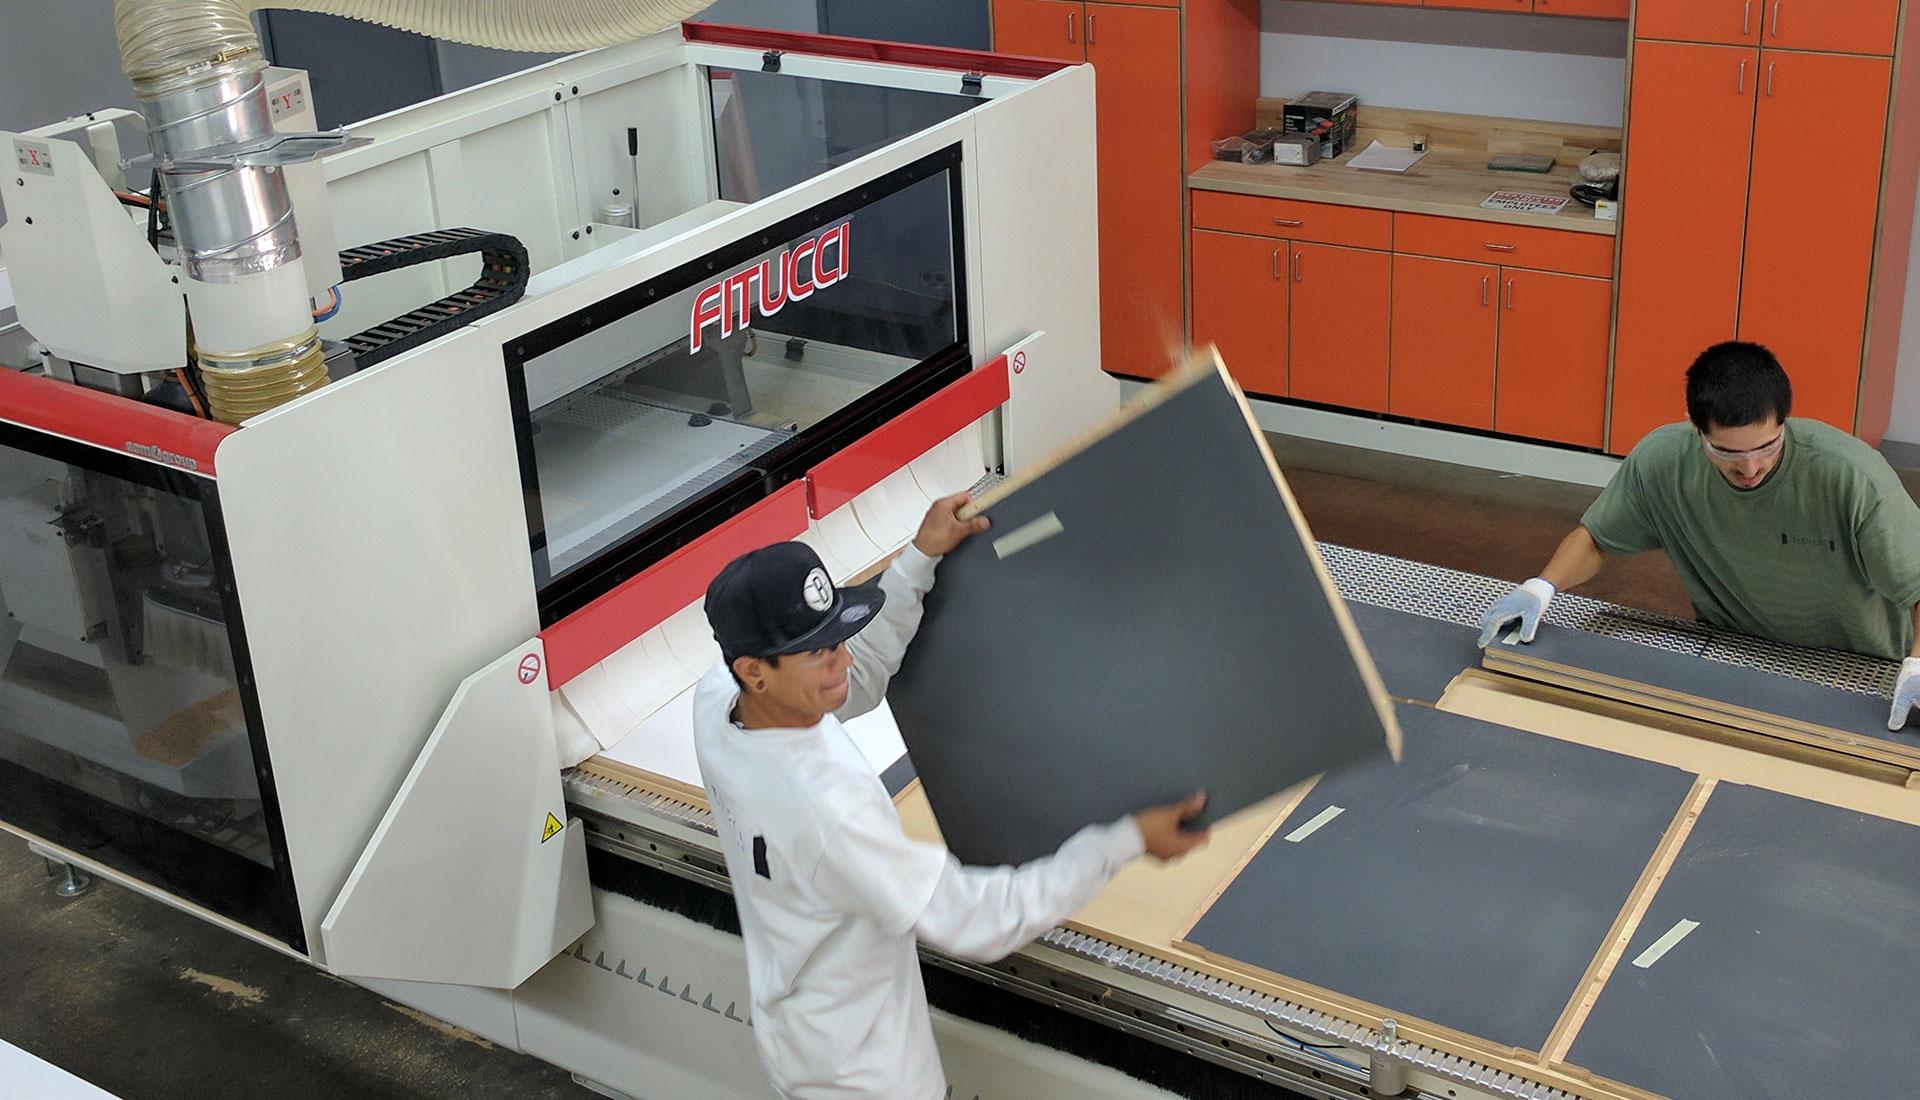 Fitucci Custom Cabinets Workshop